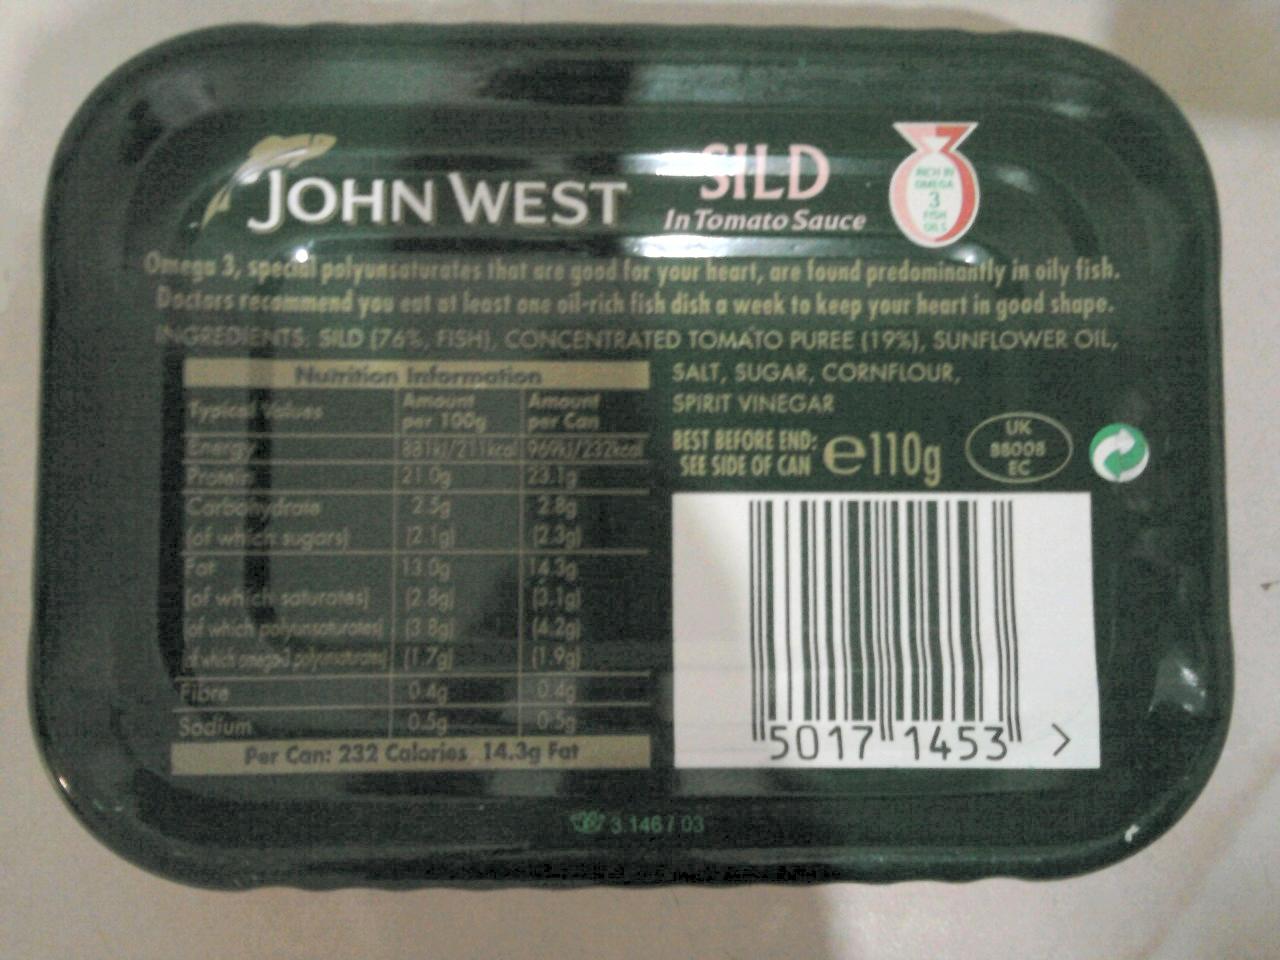 John West Sild In Tomato Sauce back of tin